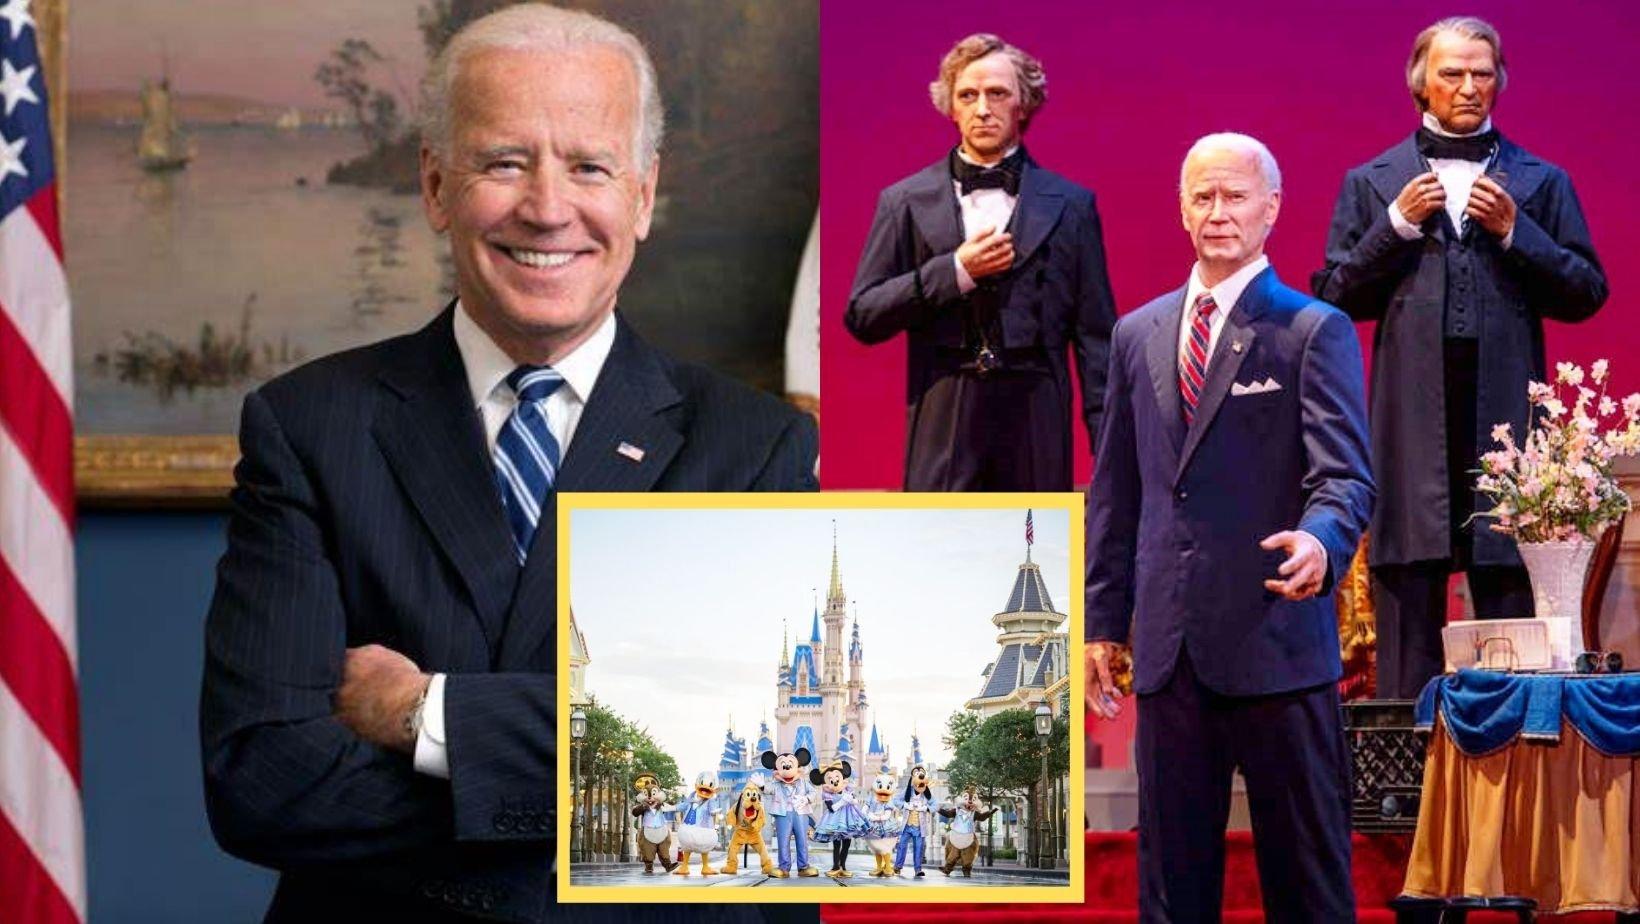 1 73.jpg?resize=412,232 - A VERY 'REALISTIC' Joe Biden Robot Will Be Installed In Disney World's Hall Of Presidents